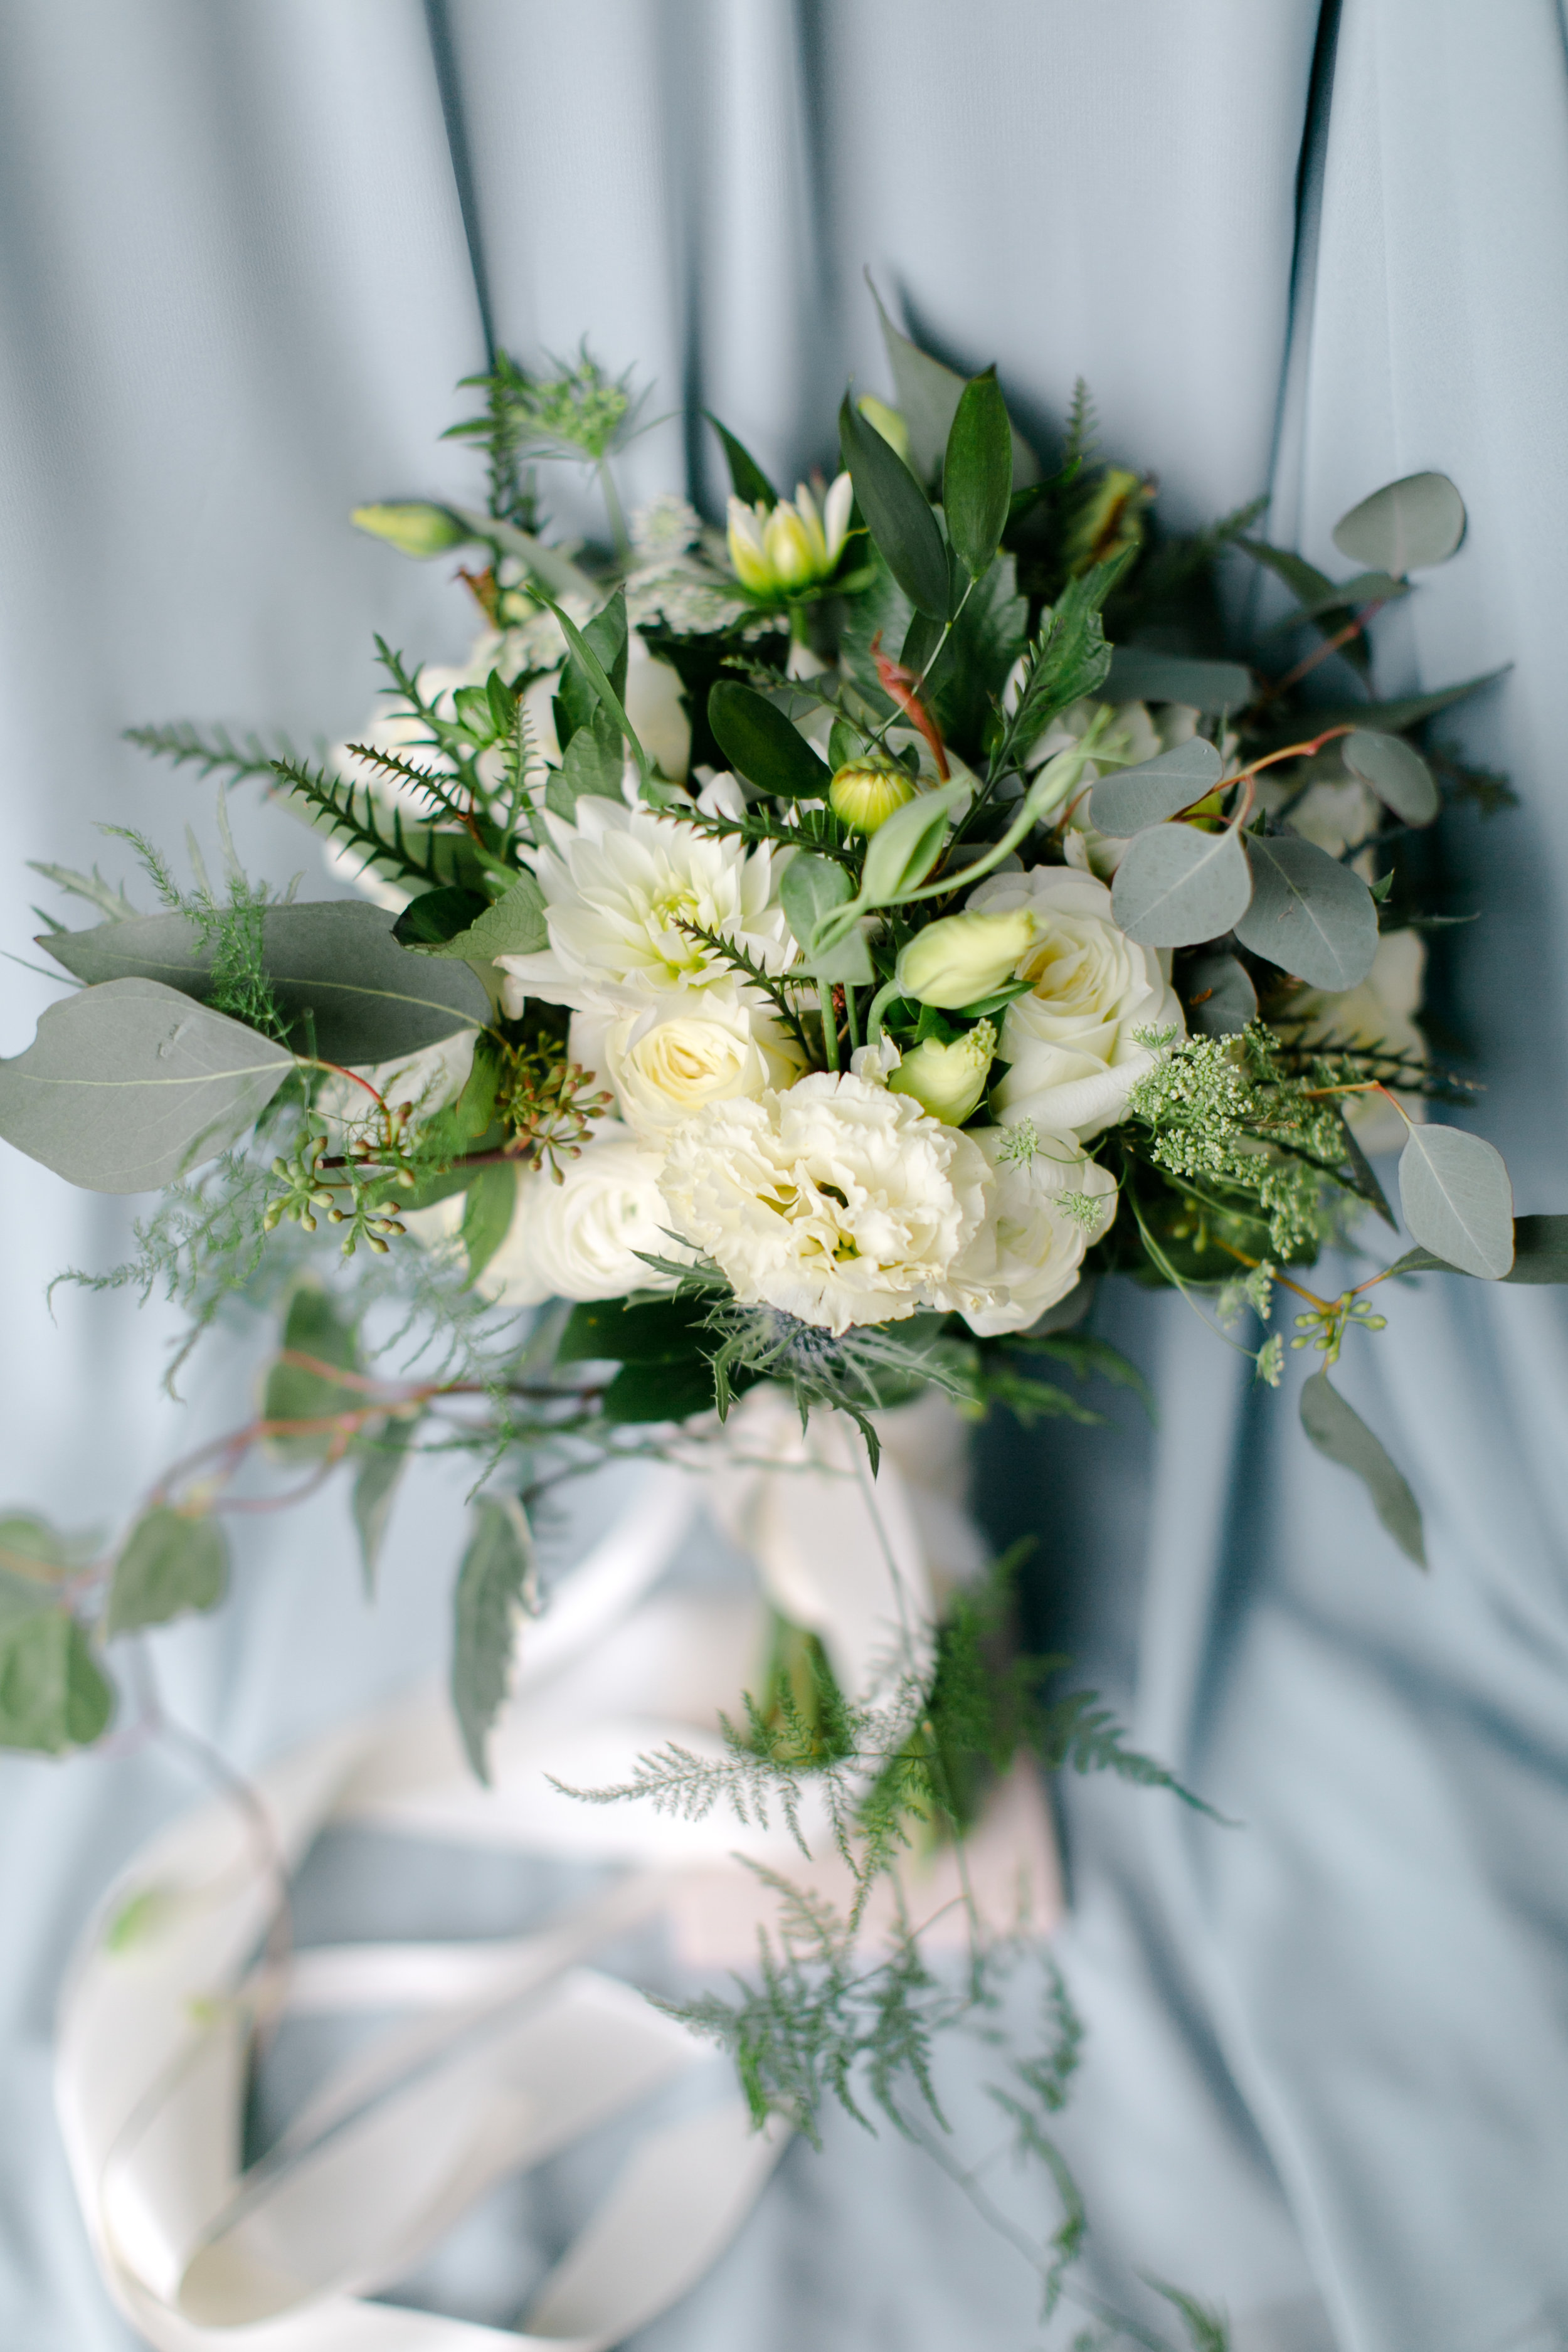 Austin_Texas_Fine_Art_Wedding_Photographer_Kayla_Snell_Photography_Antebellum_Oaks71.jpg